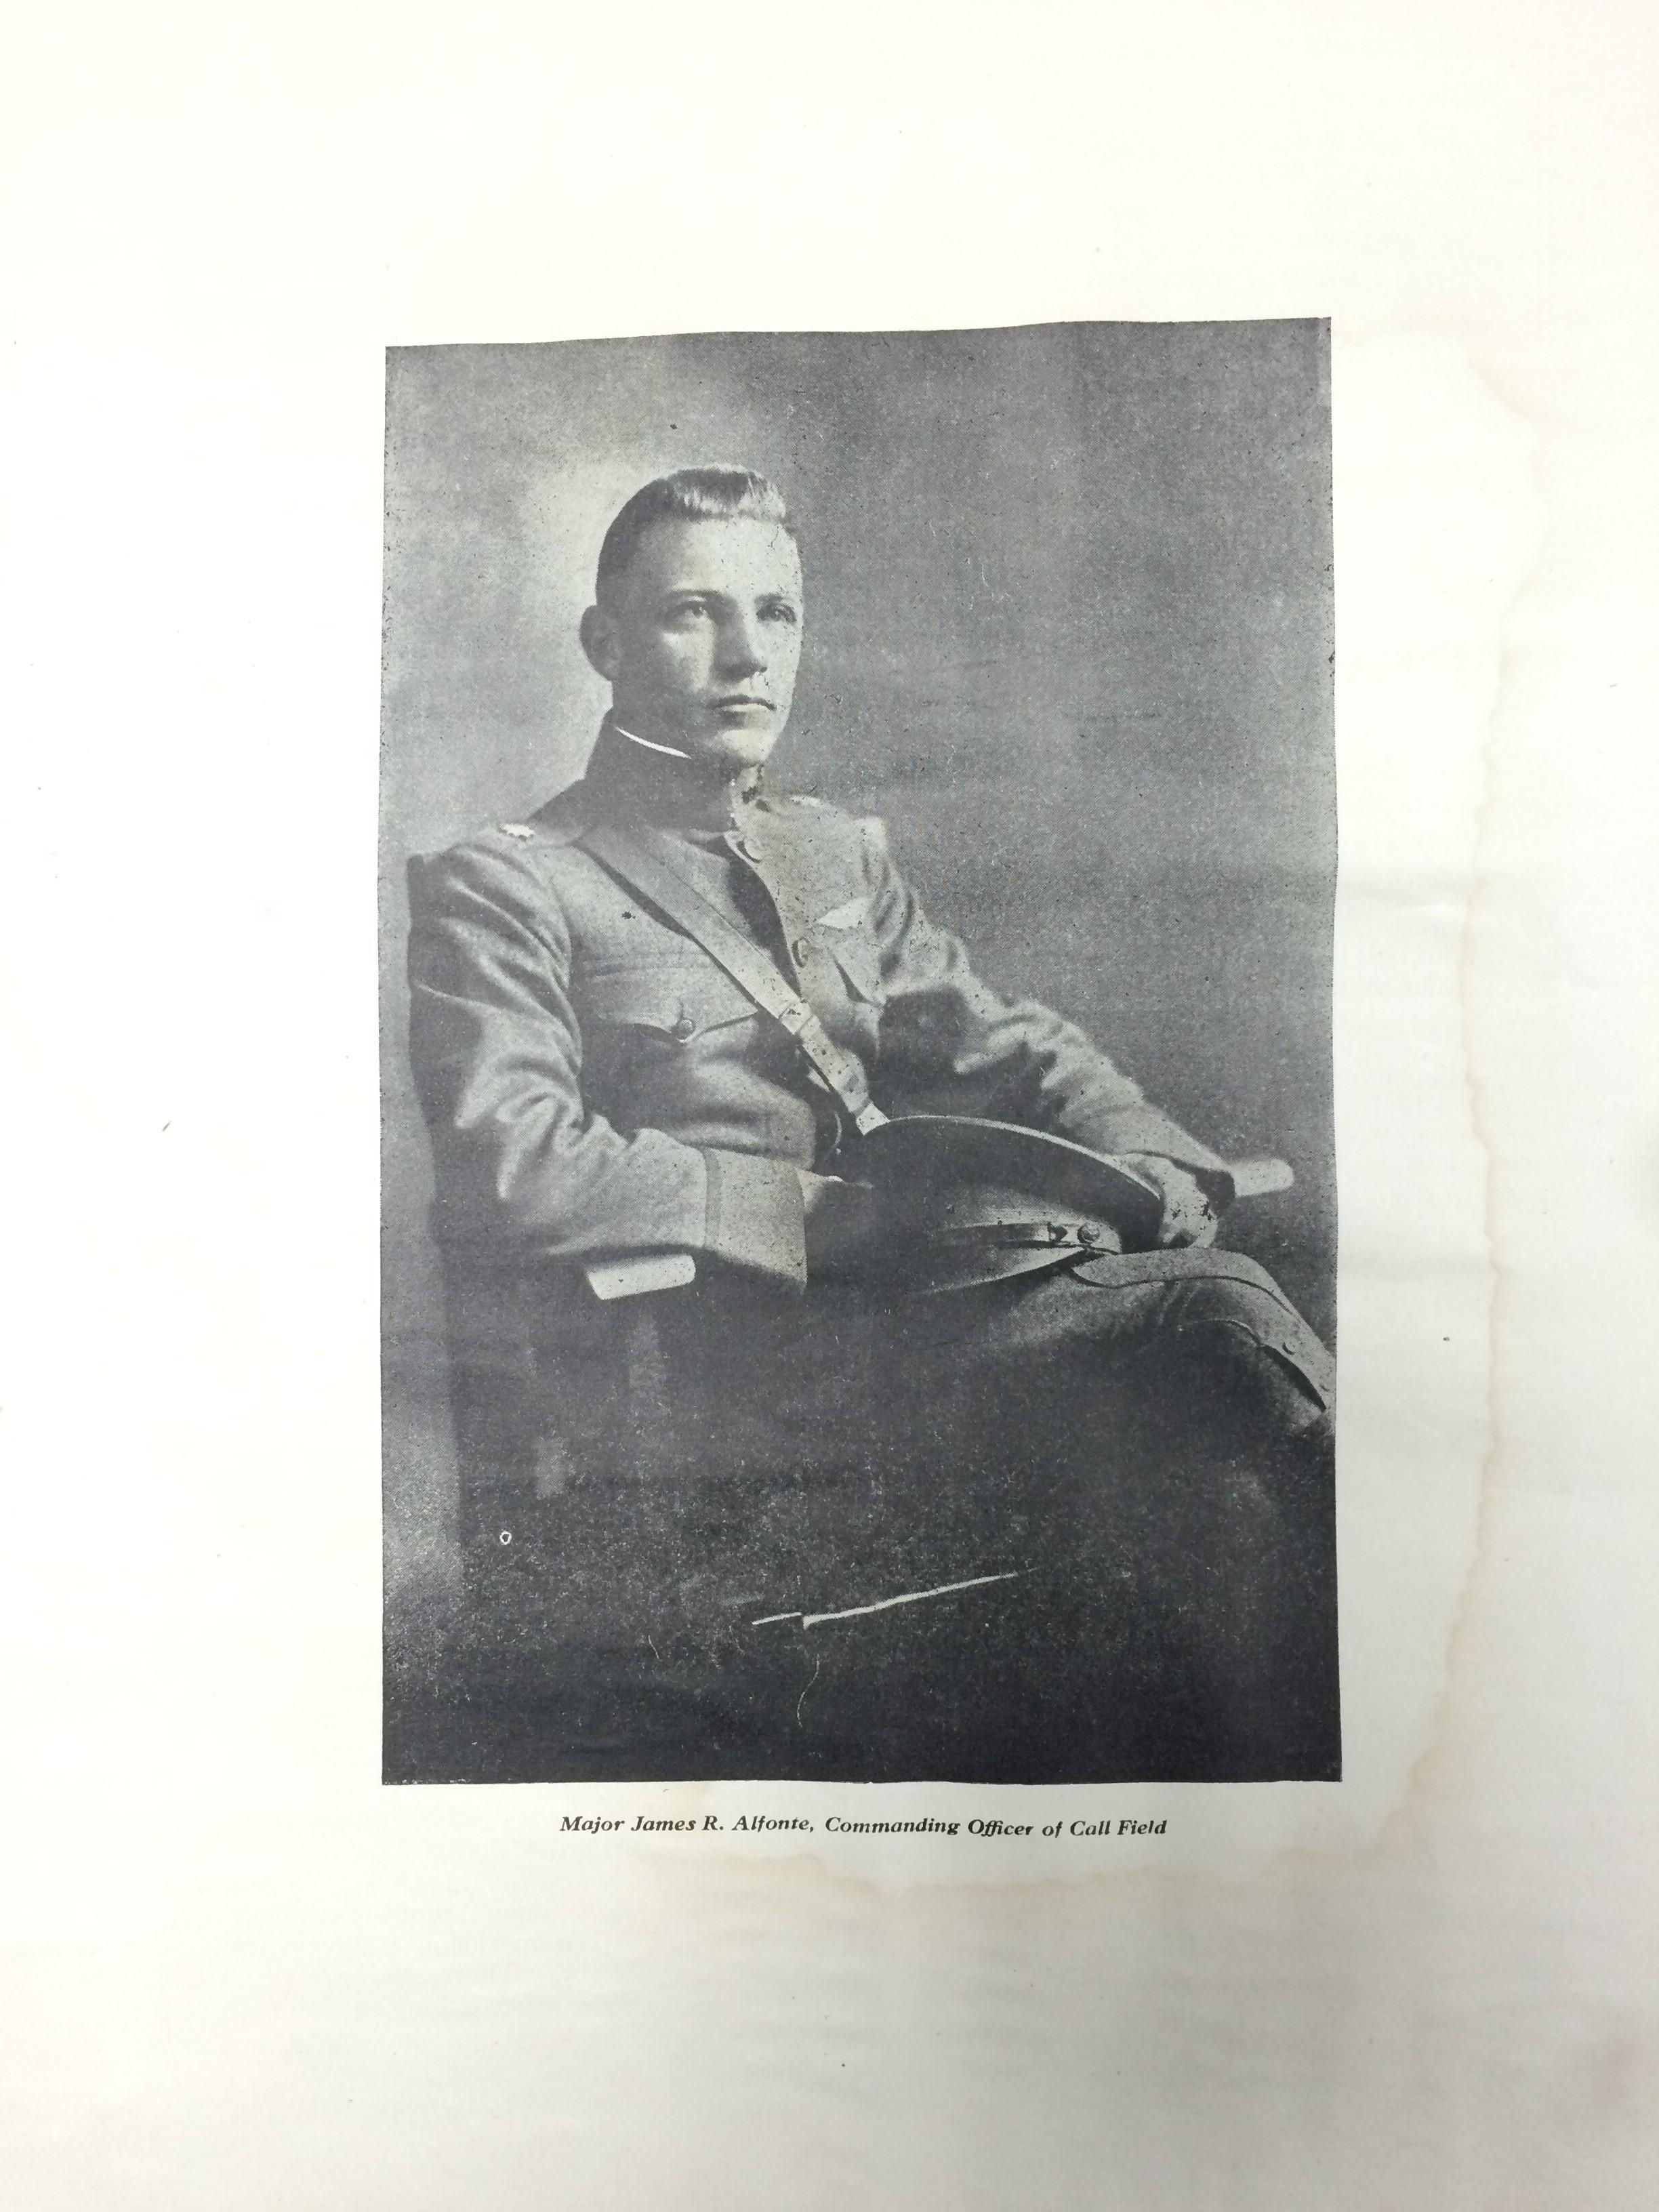 Image 4 August 15, 1918 Call Field Engineer